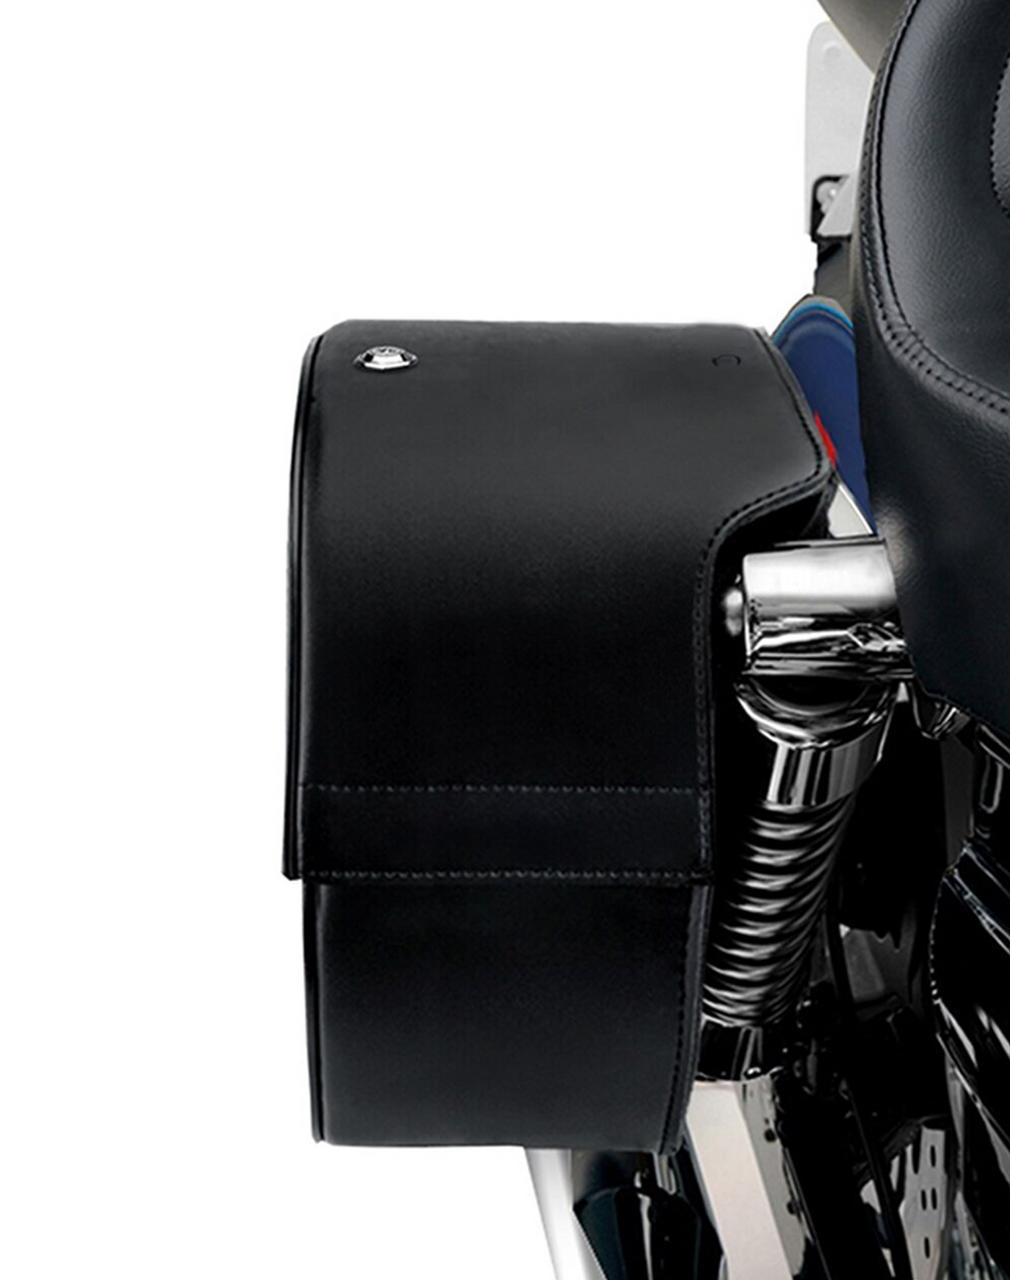 Honda VTX 1800 N Shock Cutout Slanted Studded Large Motorcycle Saddlebags Shock Cutout View